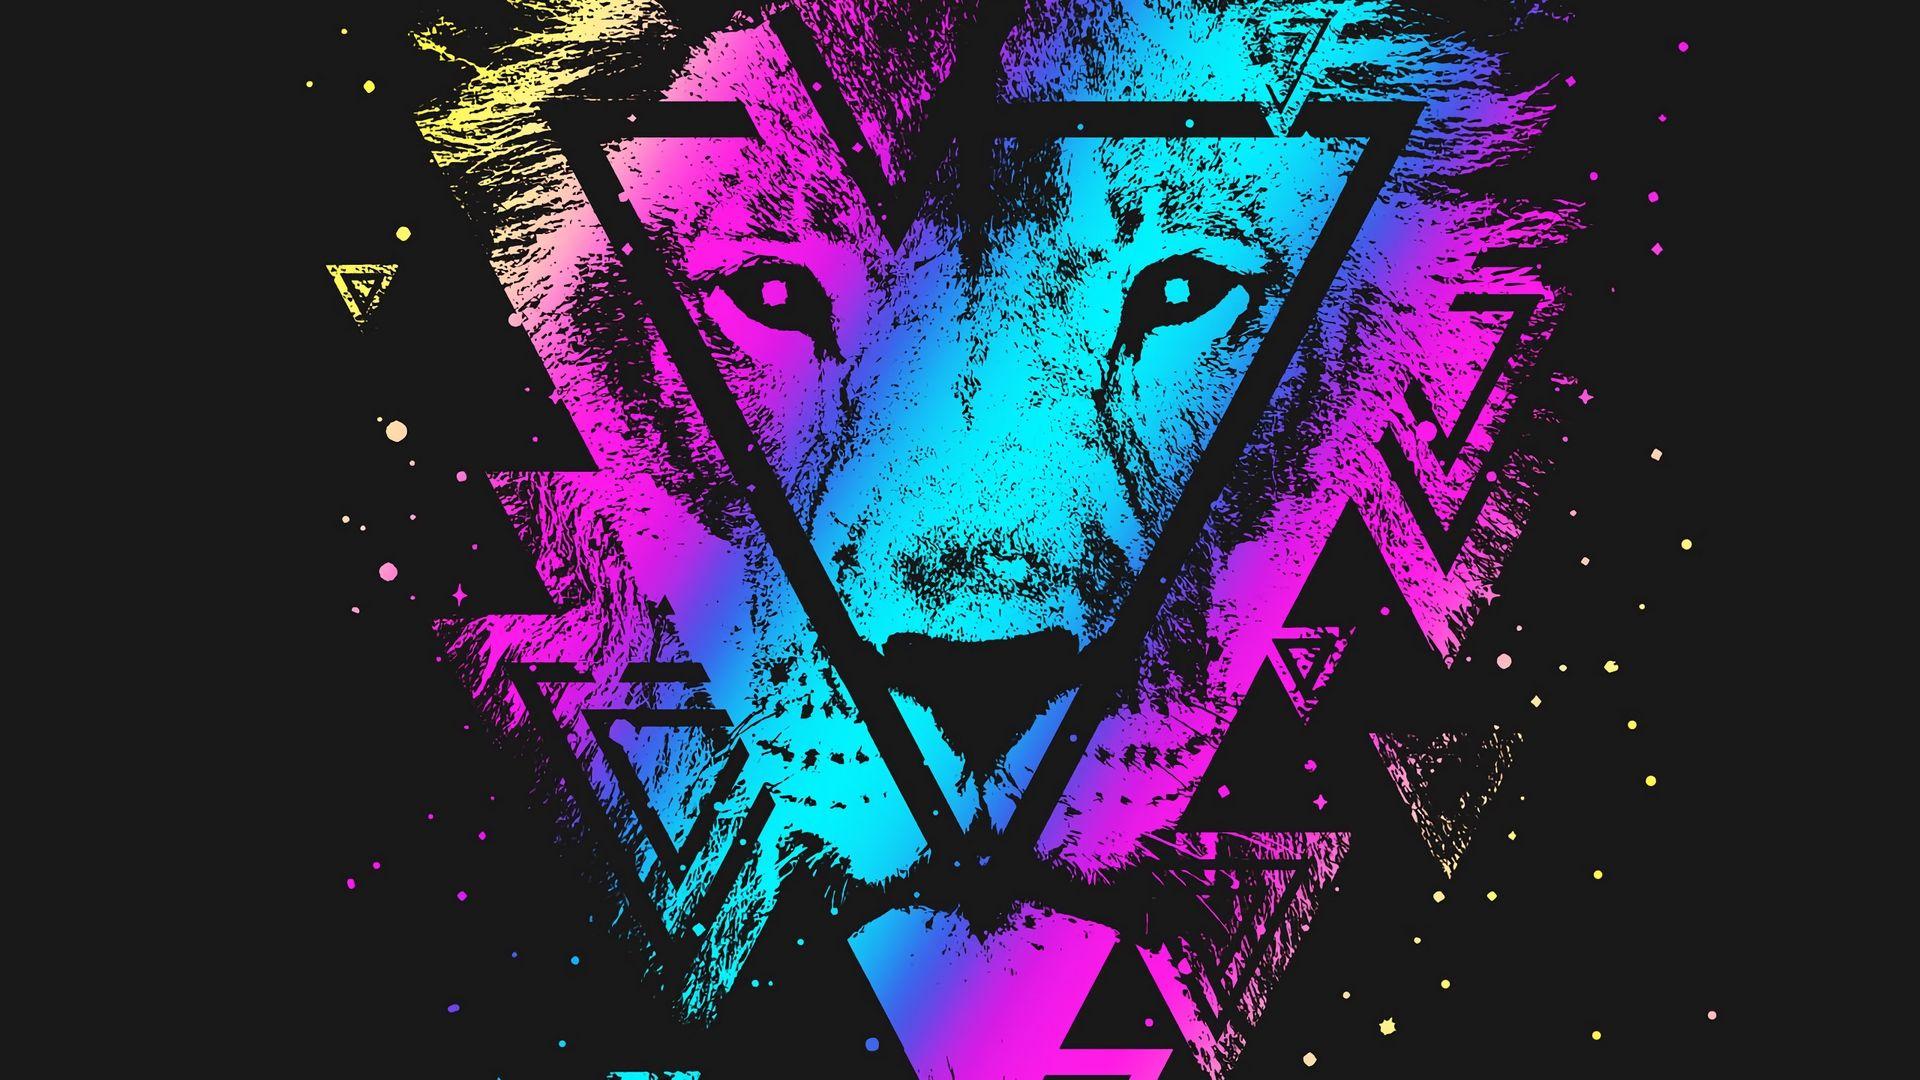 Lion Art download wallpaper image